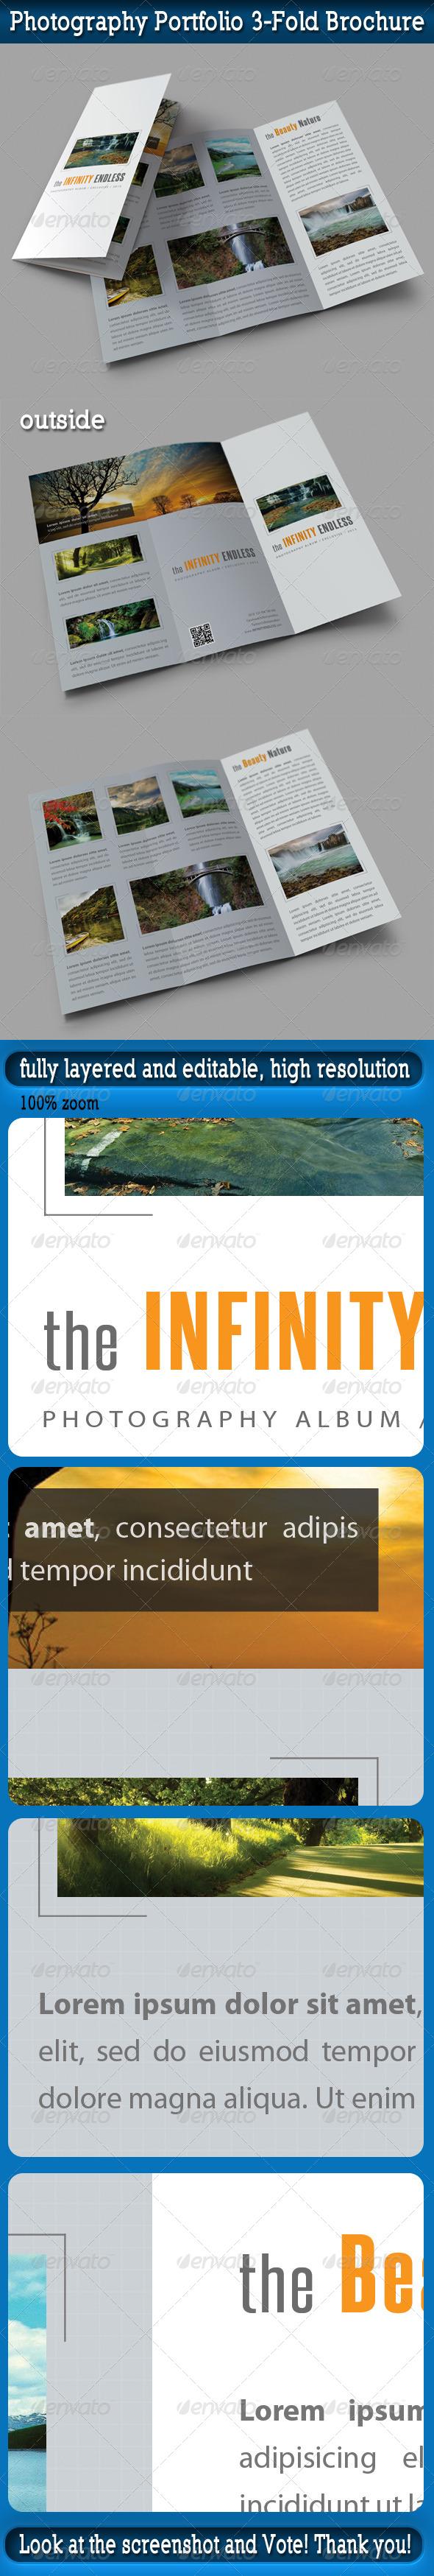 Photography Portfolio 3-Fold Brochure - Portfolio Brochures